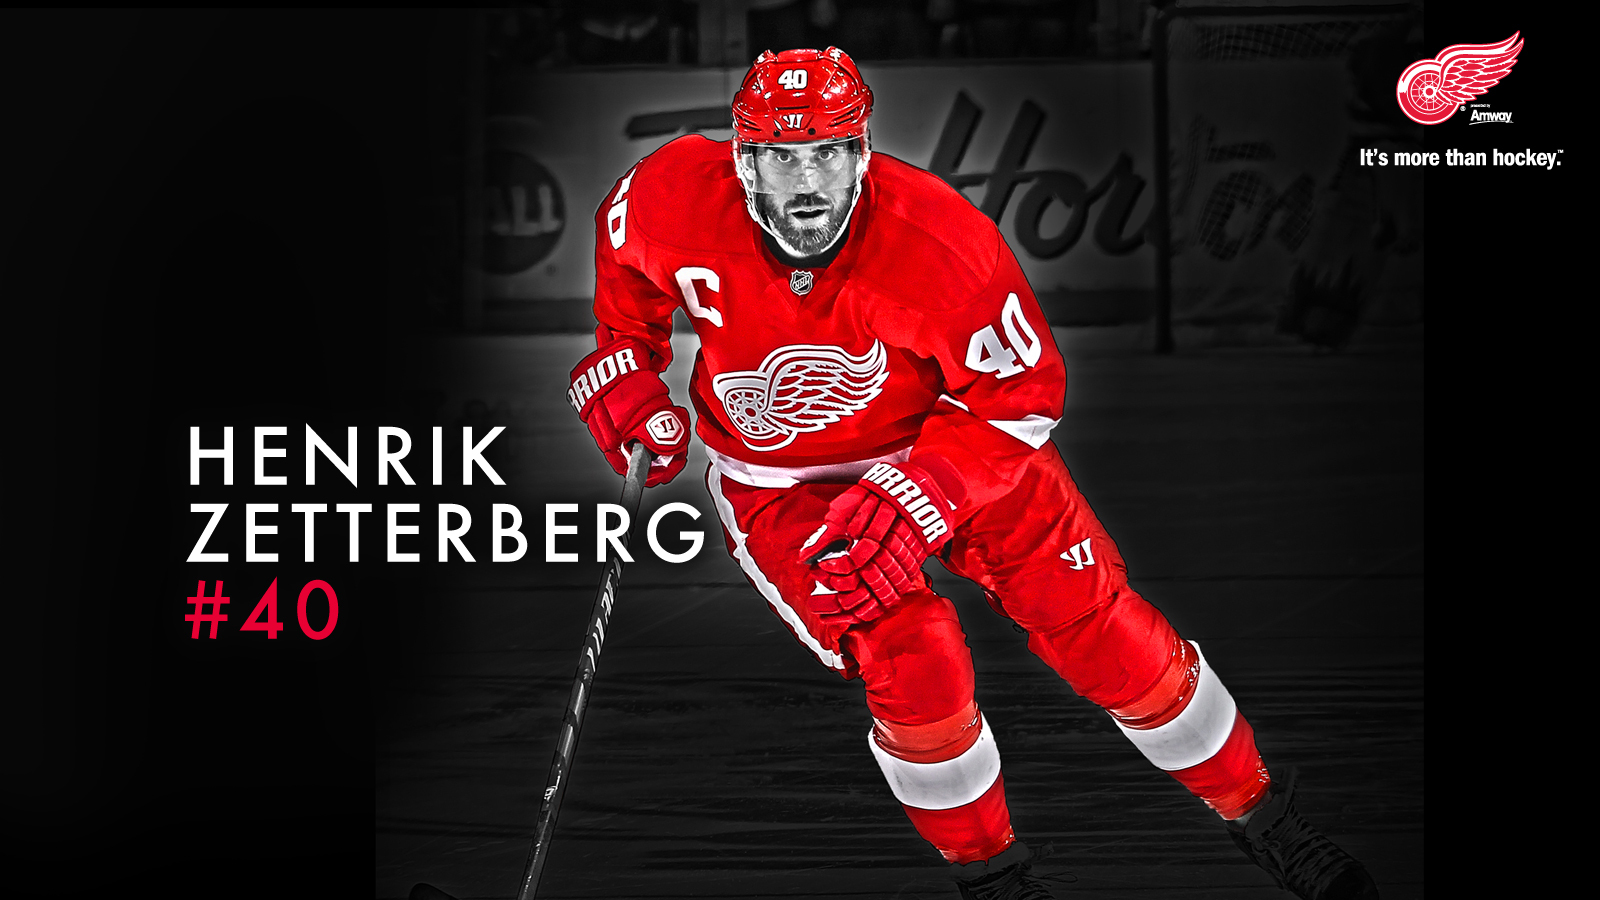 Hockey Henrik Zetterberg Detroit Red Wings wallpaper 1600x900 1600x900